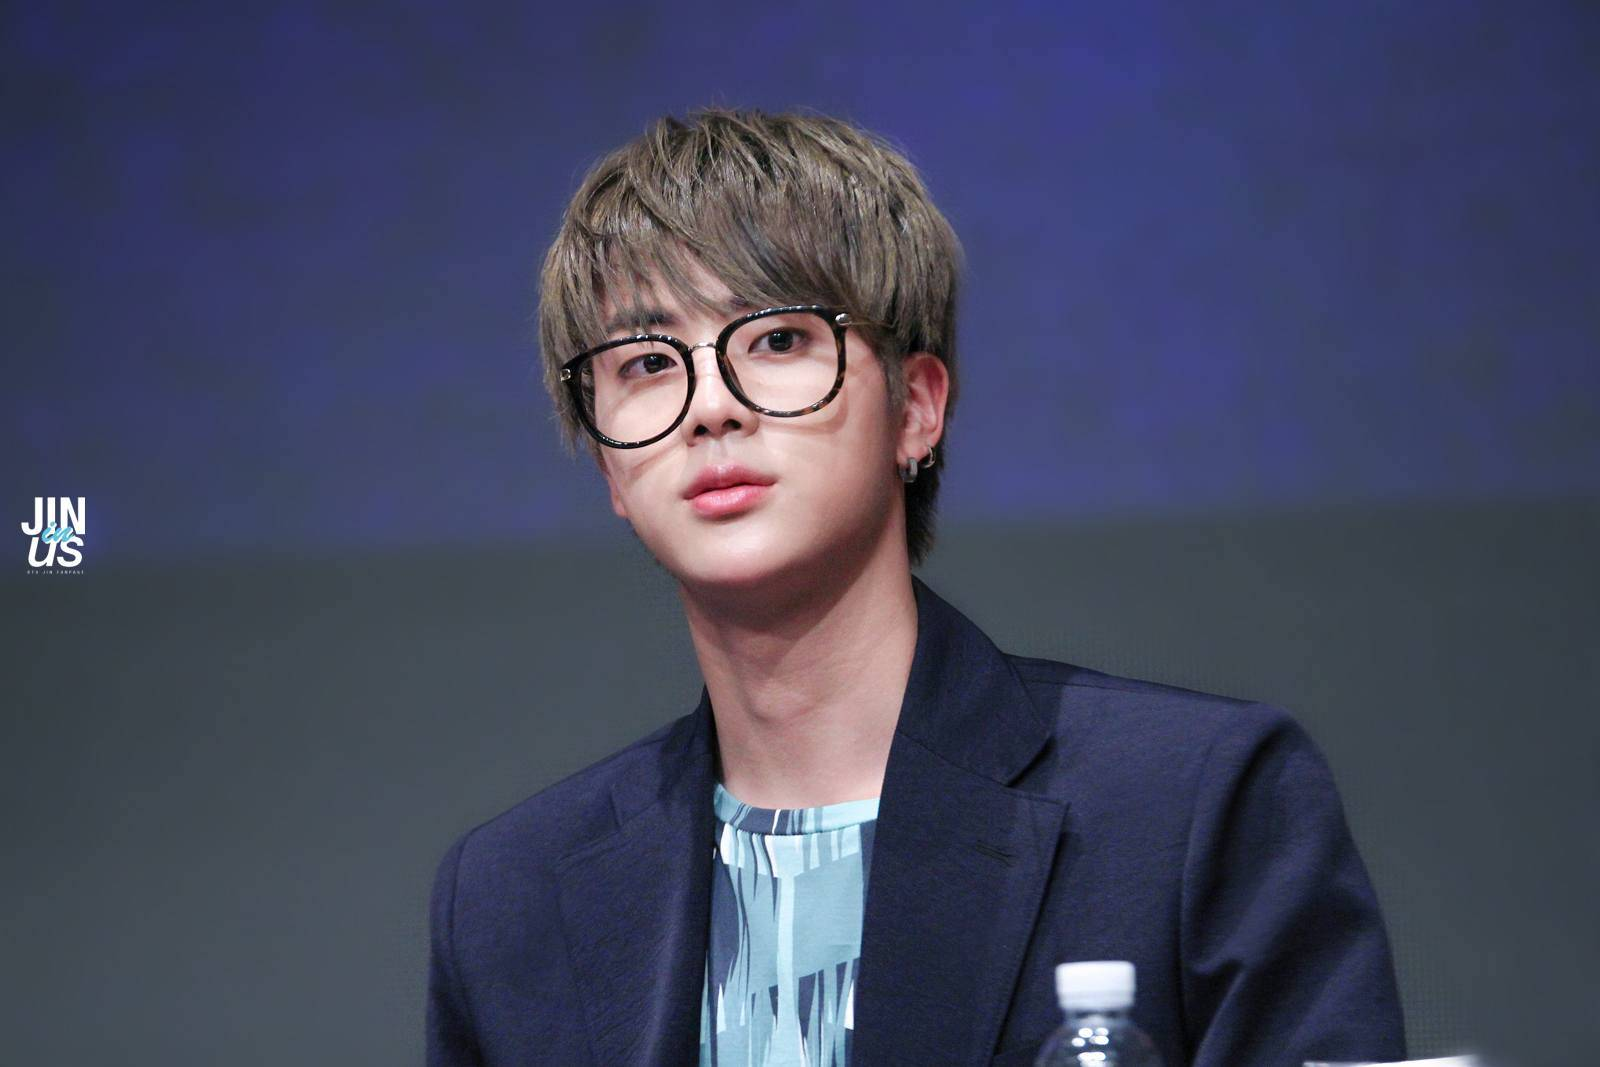 Jin wears the Moonshot Rectangular